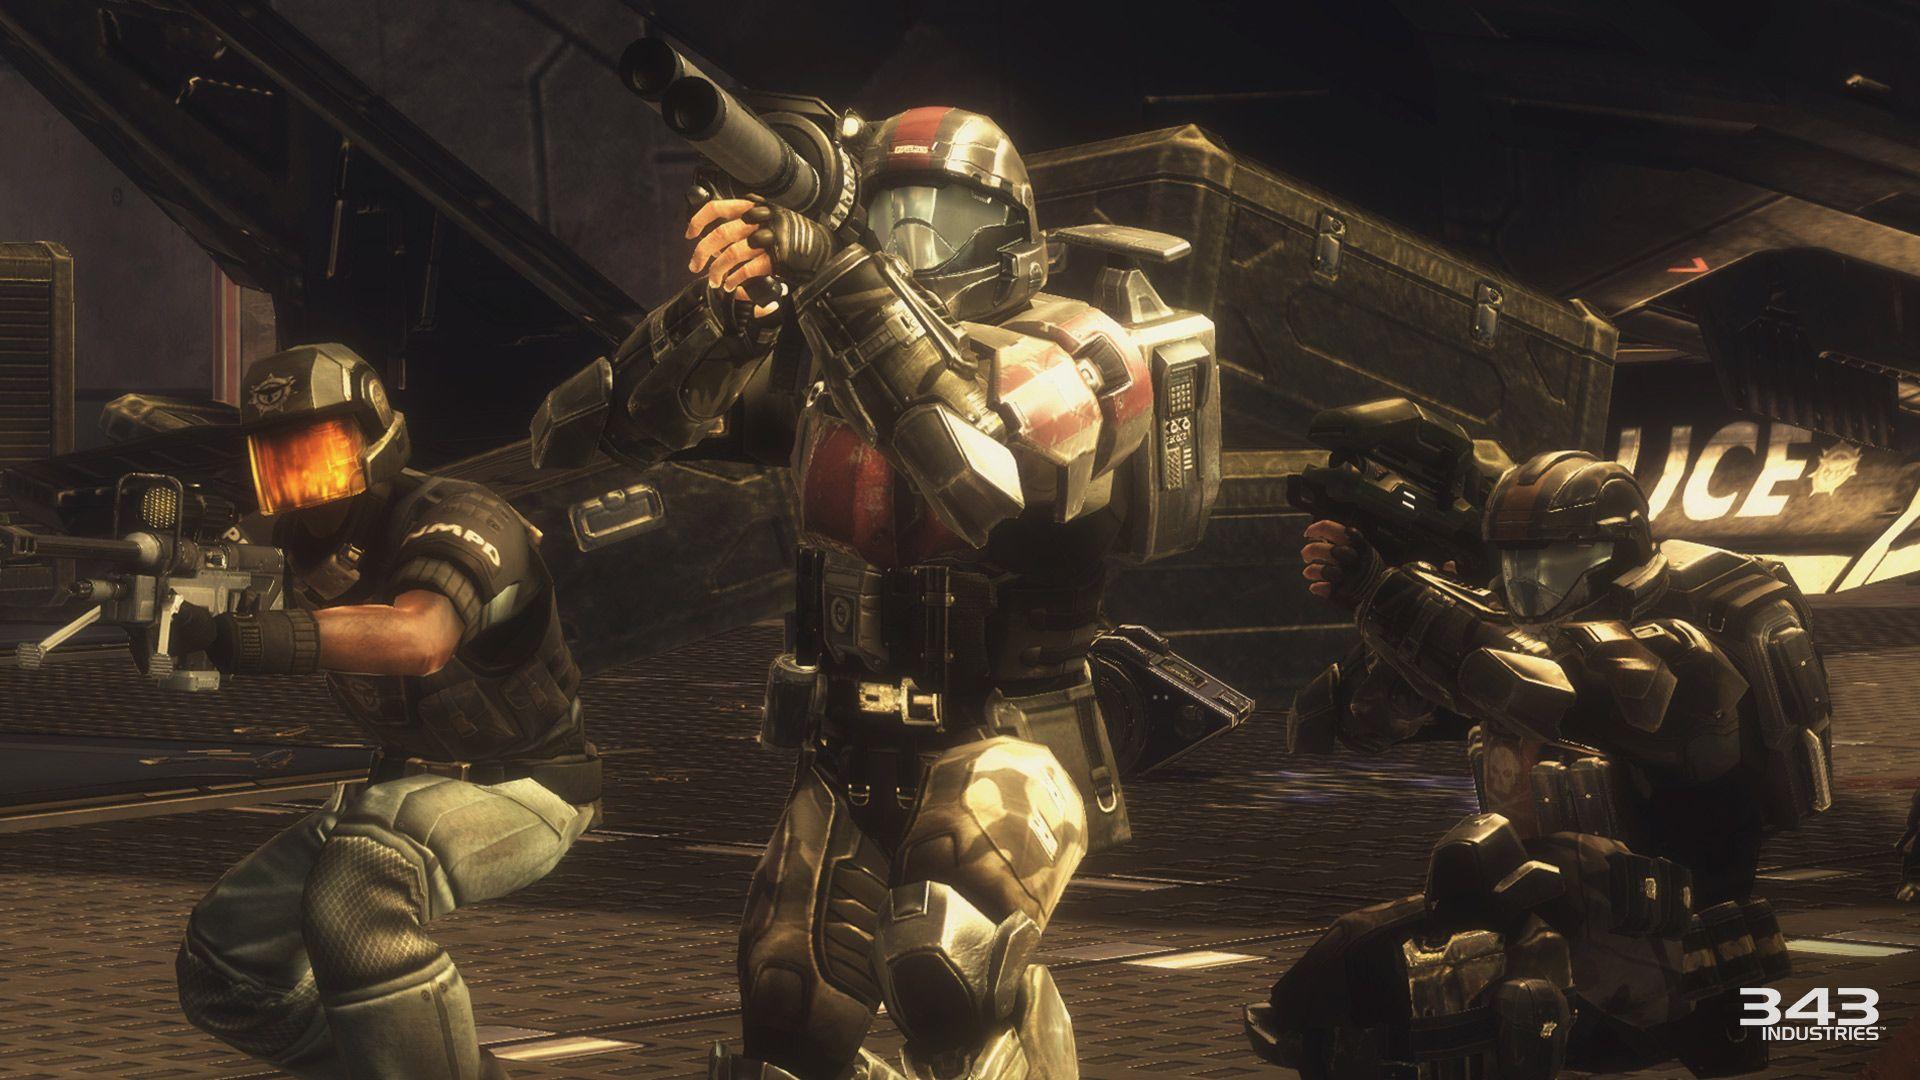 Matchmaking della campagna Halo 4